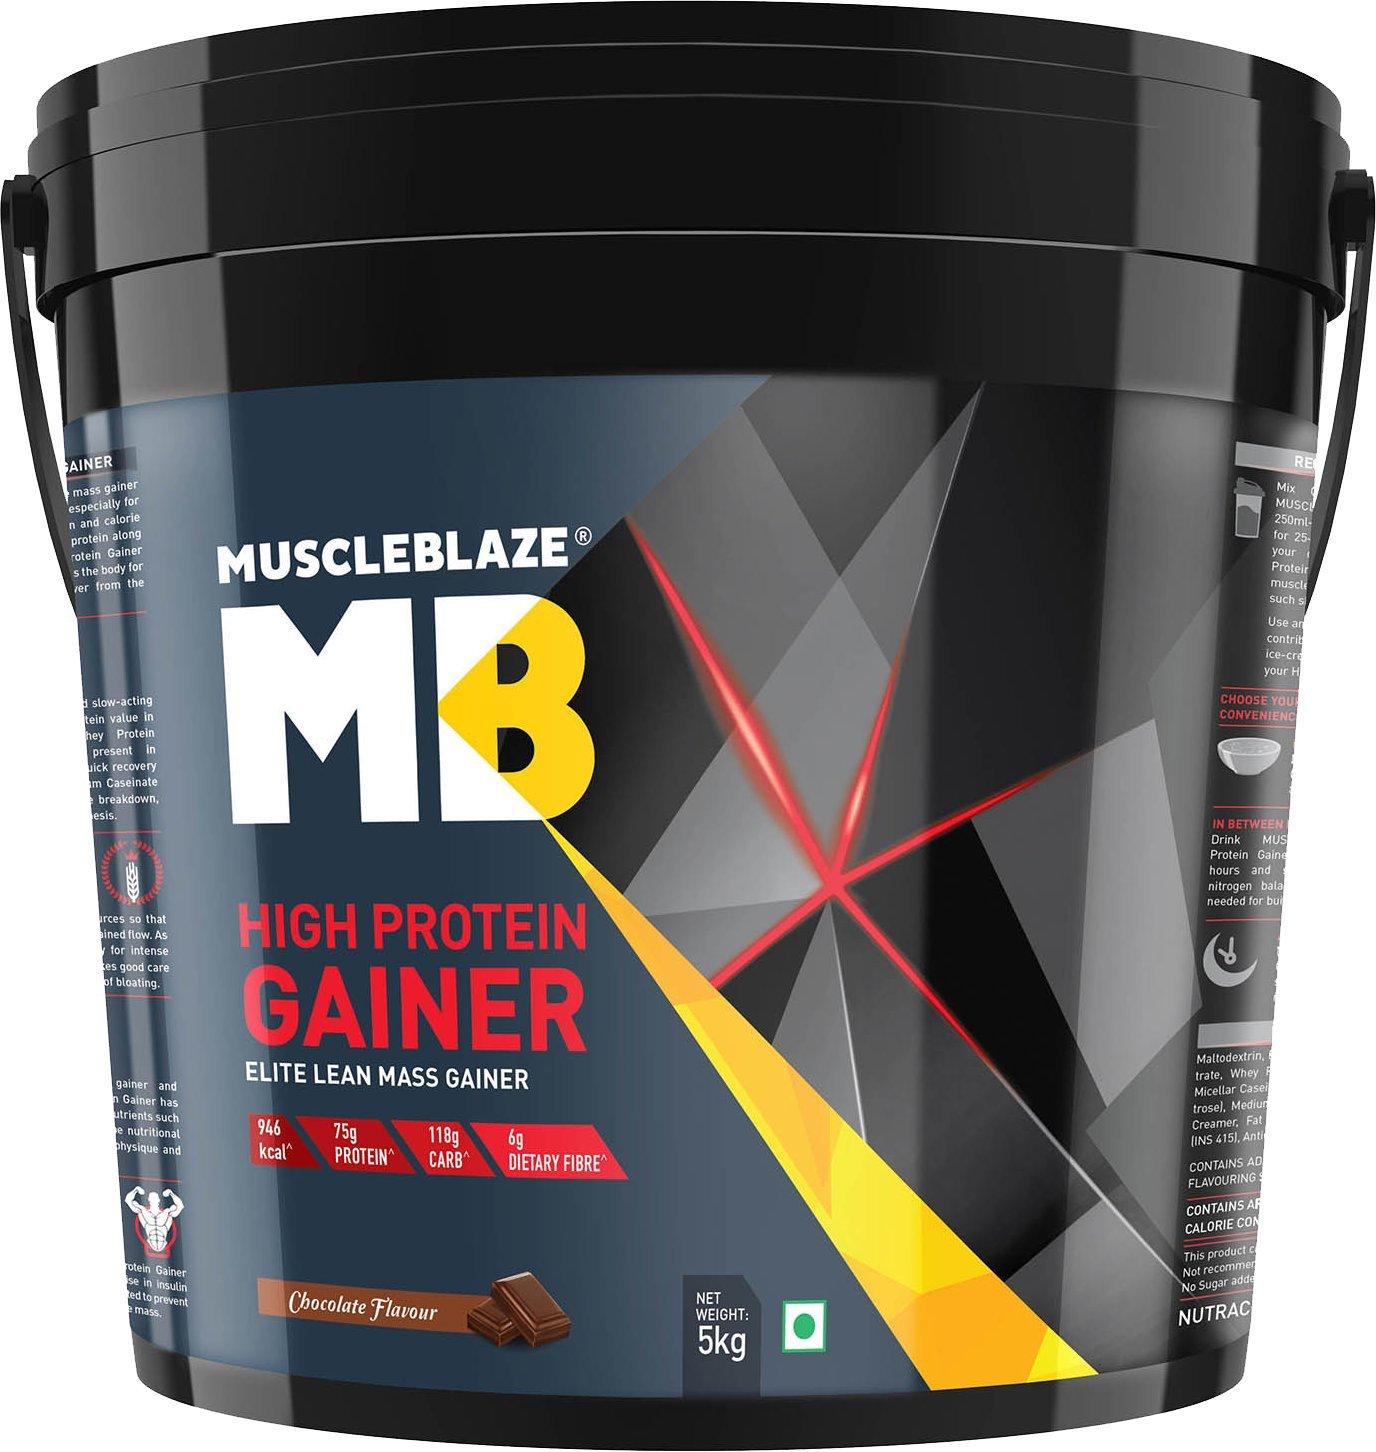 MuscleBlaze High Protein Lean Mass Gainer 11 lb Chocolate